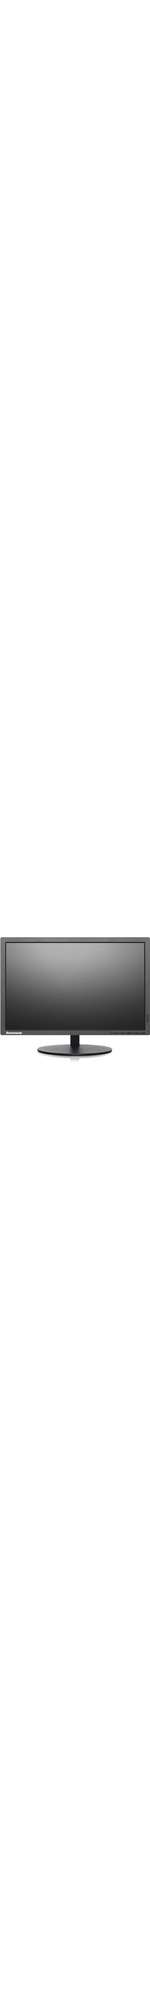 Lenovo ThinkVision T2054p 49.5 cm 19.5And#34; WXGAplus LED LCD Monitor - 16:10 - Raven Black - 1440 x 900 - 250 cd/mAndamp;#178; - 7 ms - HDMI - VGA - DisplayPort